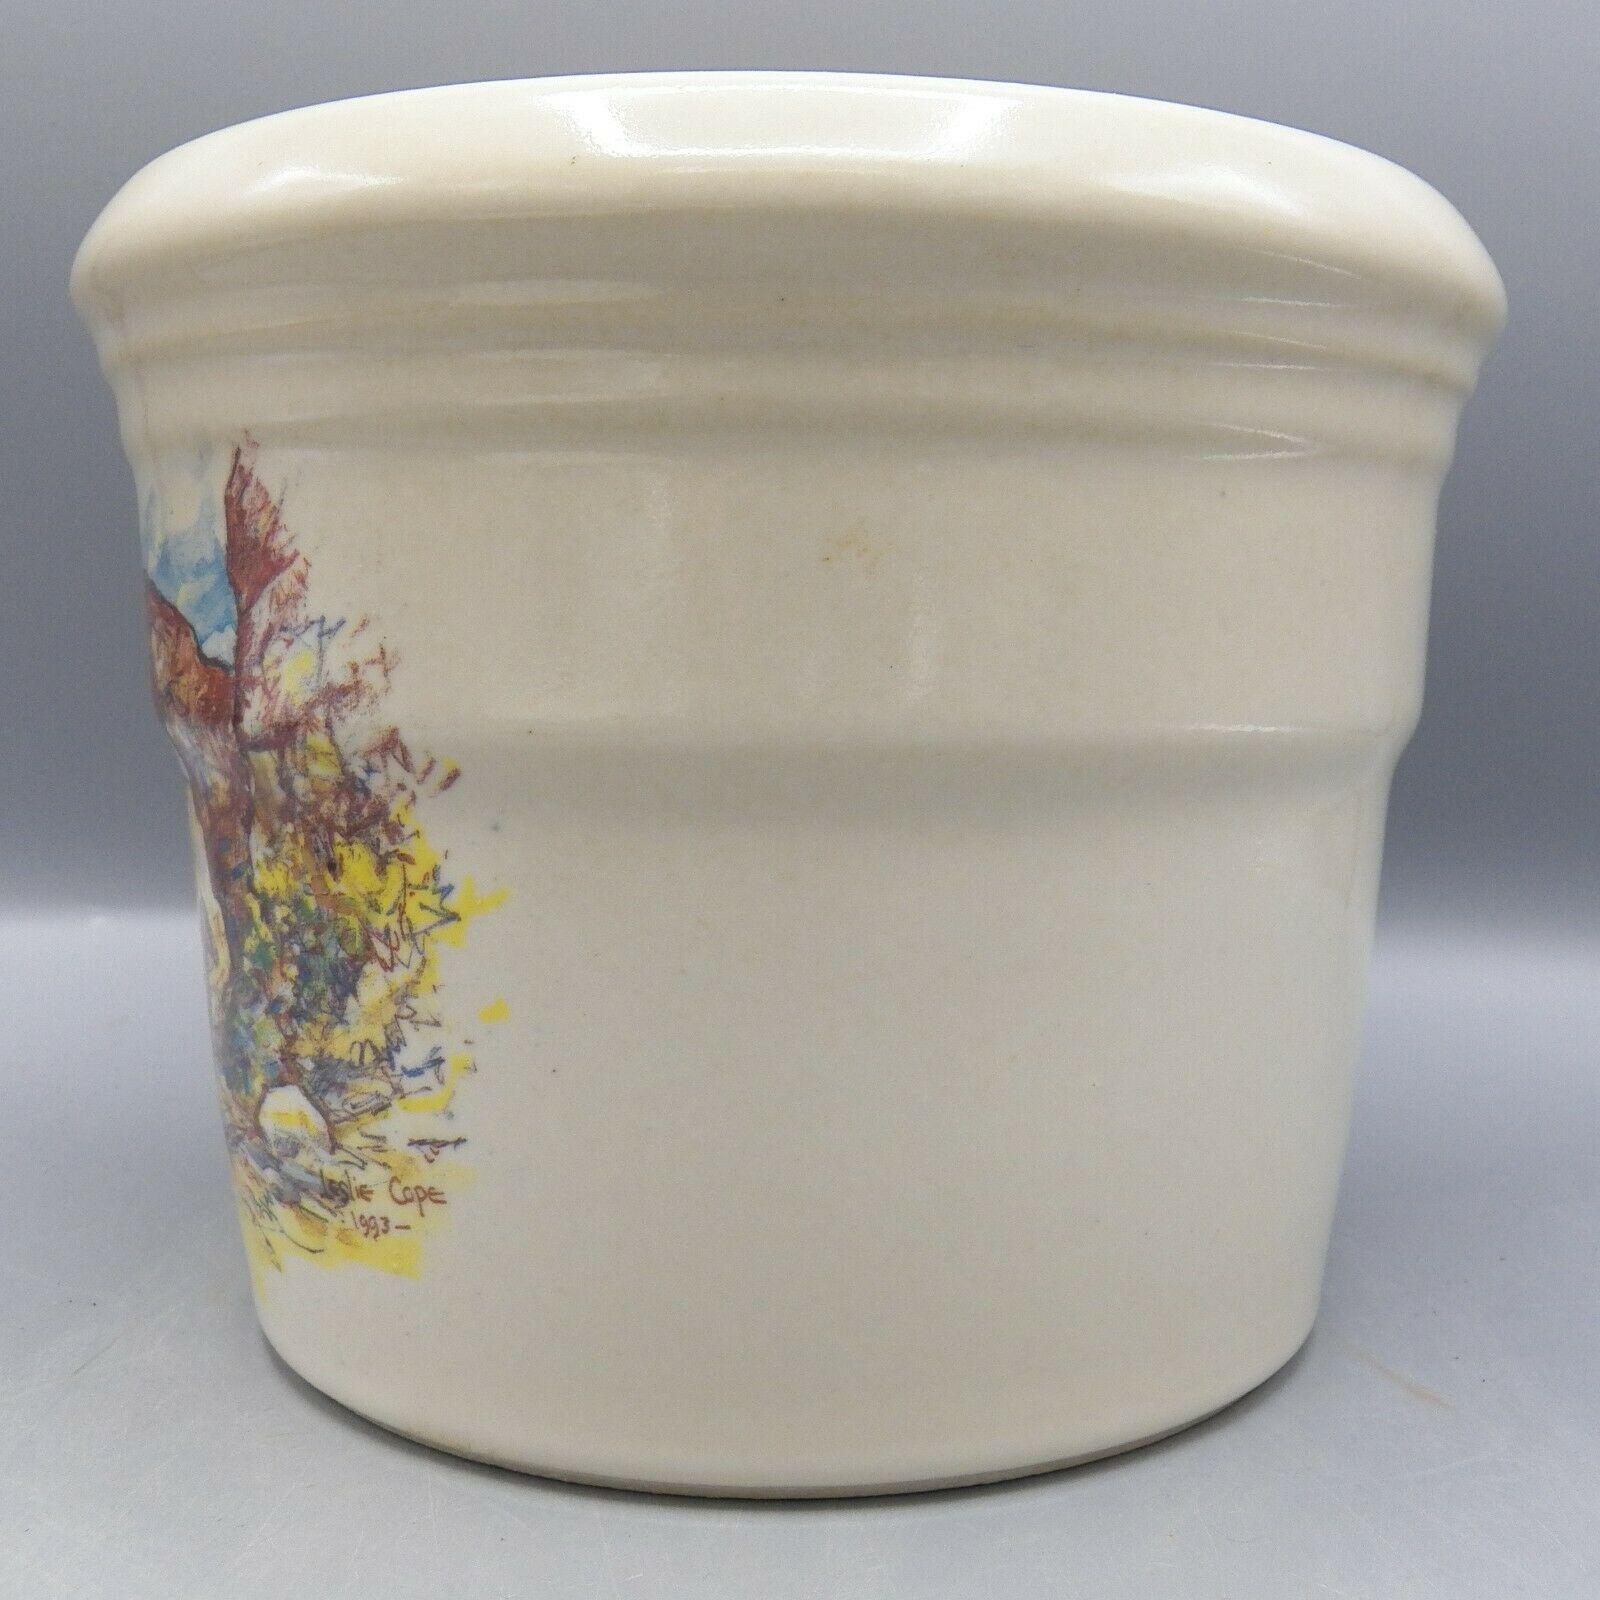 Zanesville Stoneware Zane Grey At Rainbow Bridge Leslie Cope Vase Pot Pottery image 7